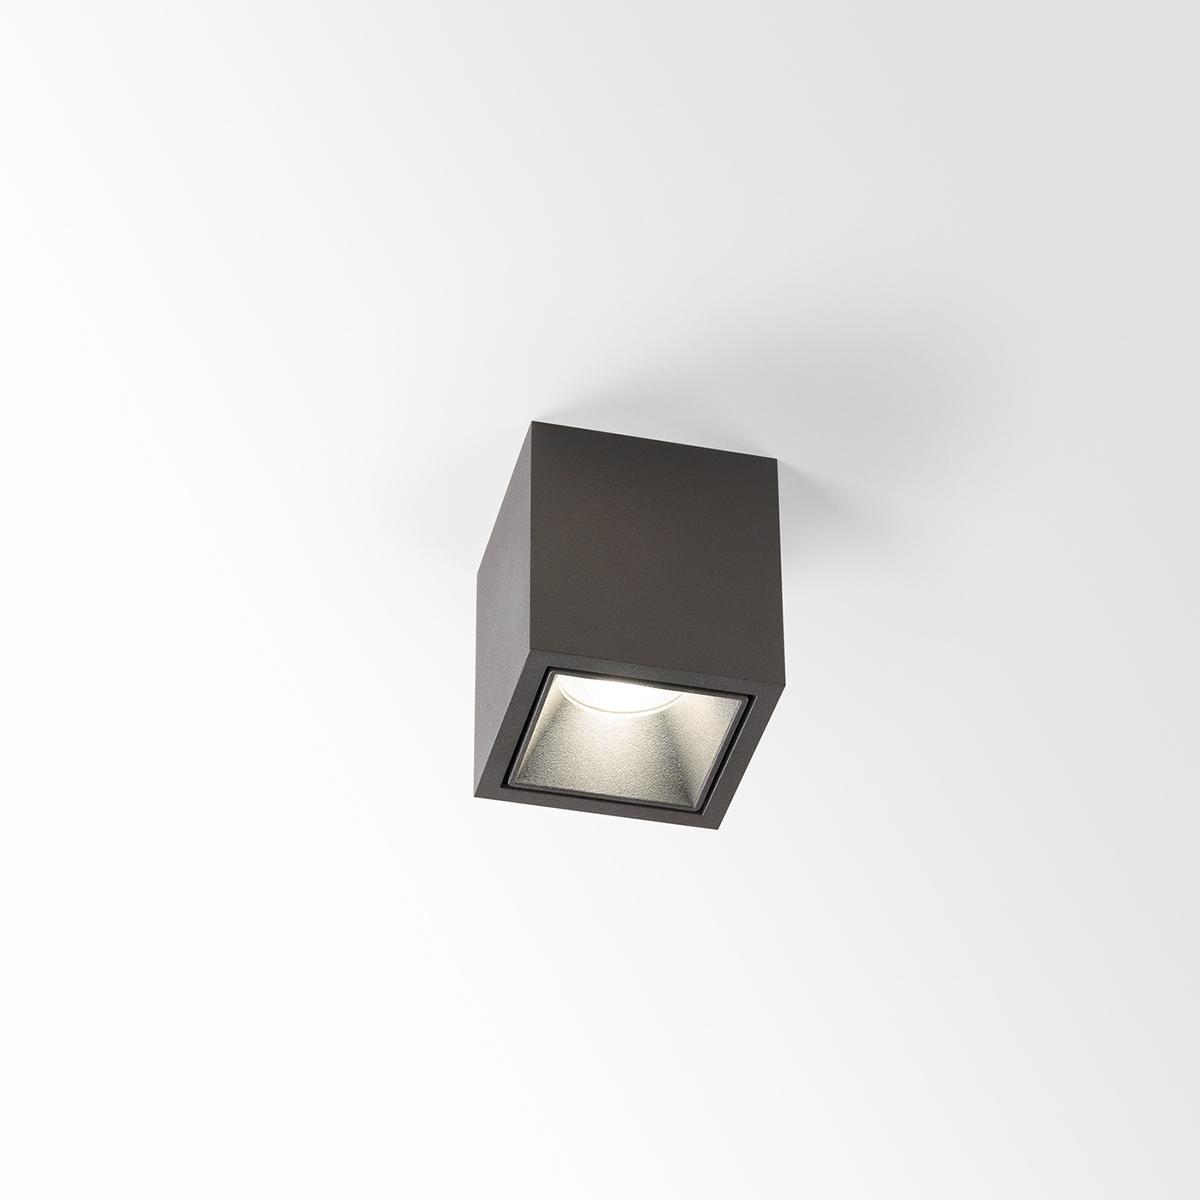 Boxy L+ - LED Ceiling Light